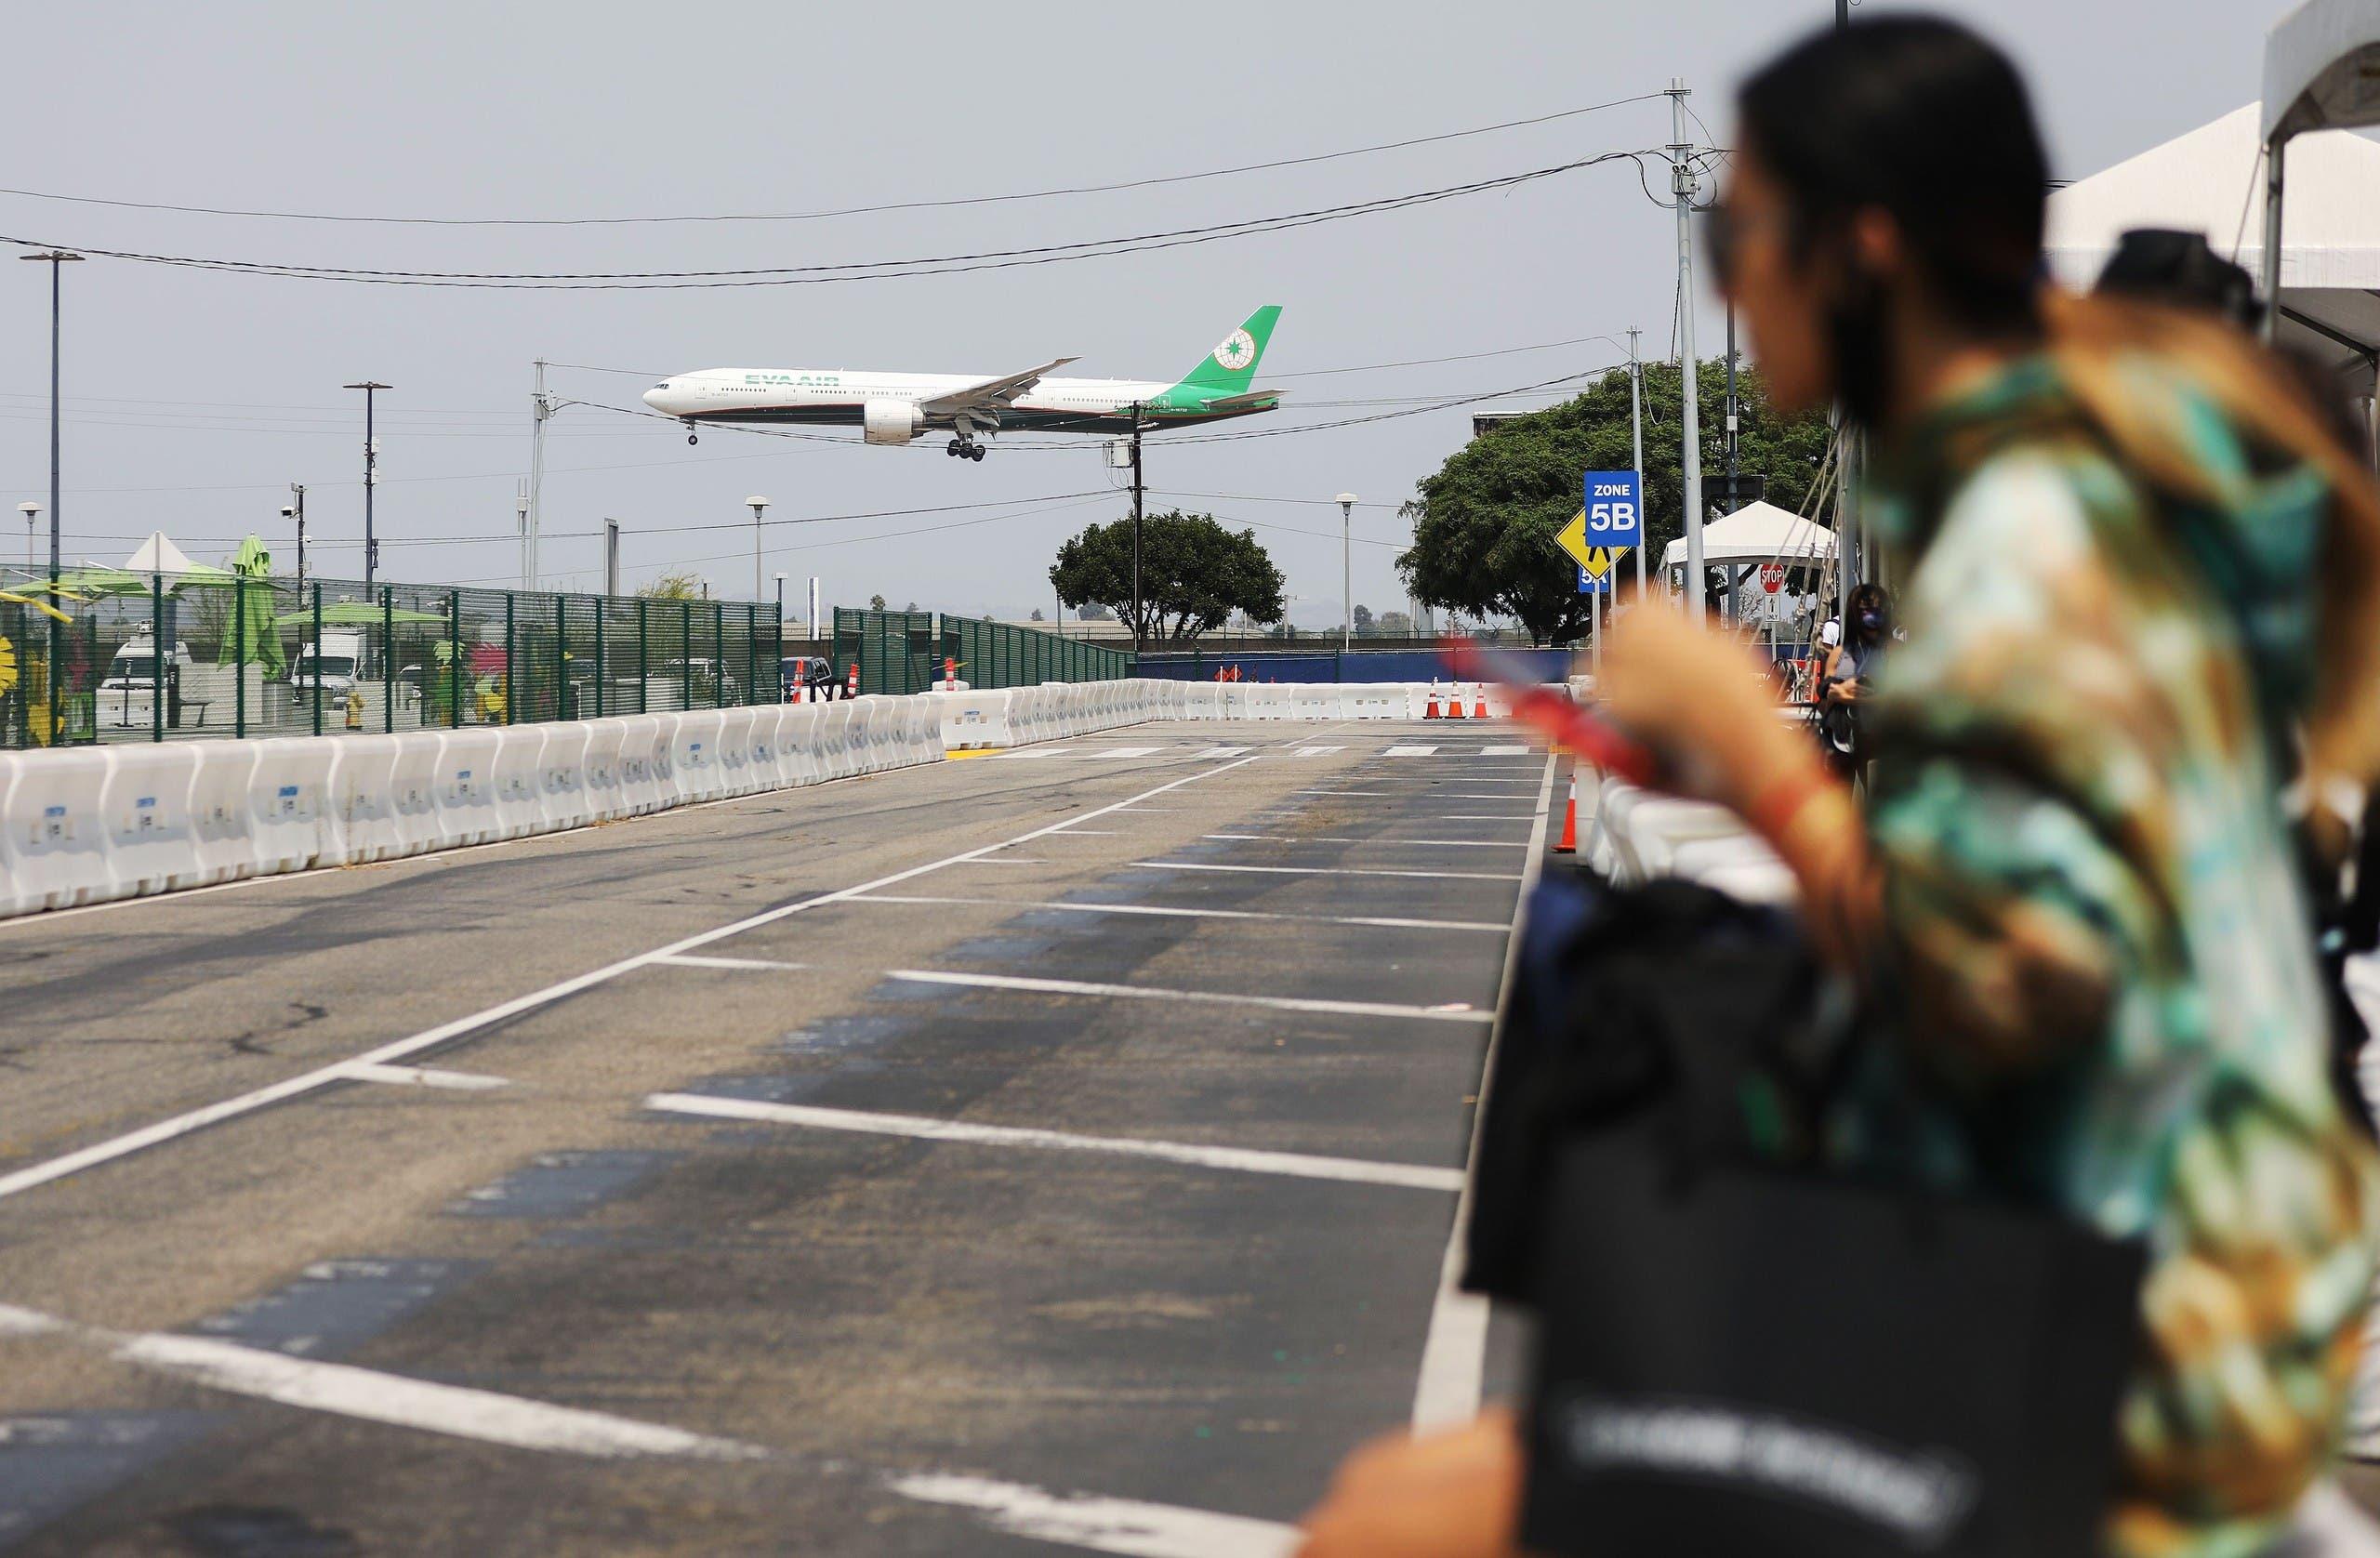 An EVA Air flight lands near a Lyft pickup area at Los Angeles International Airport (LAX) on August 20, 2020. (AFP)